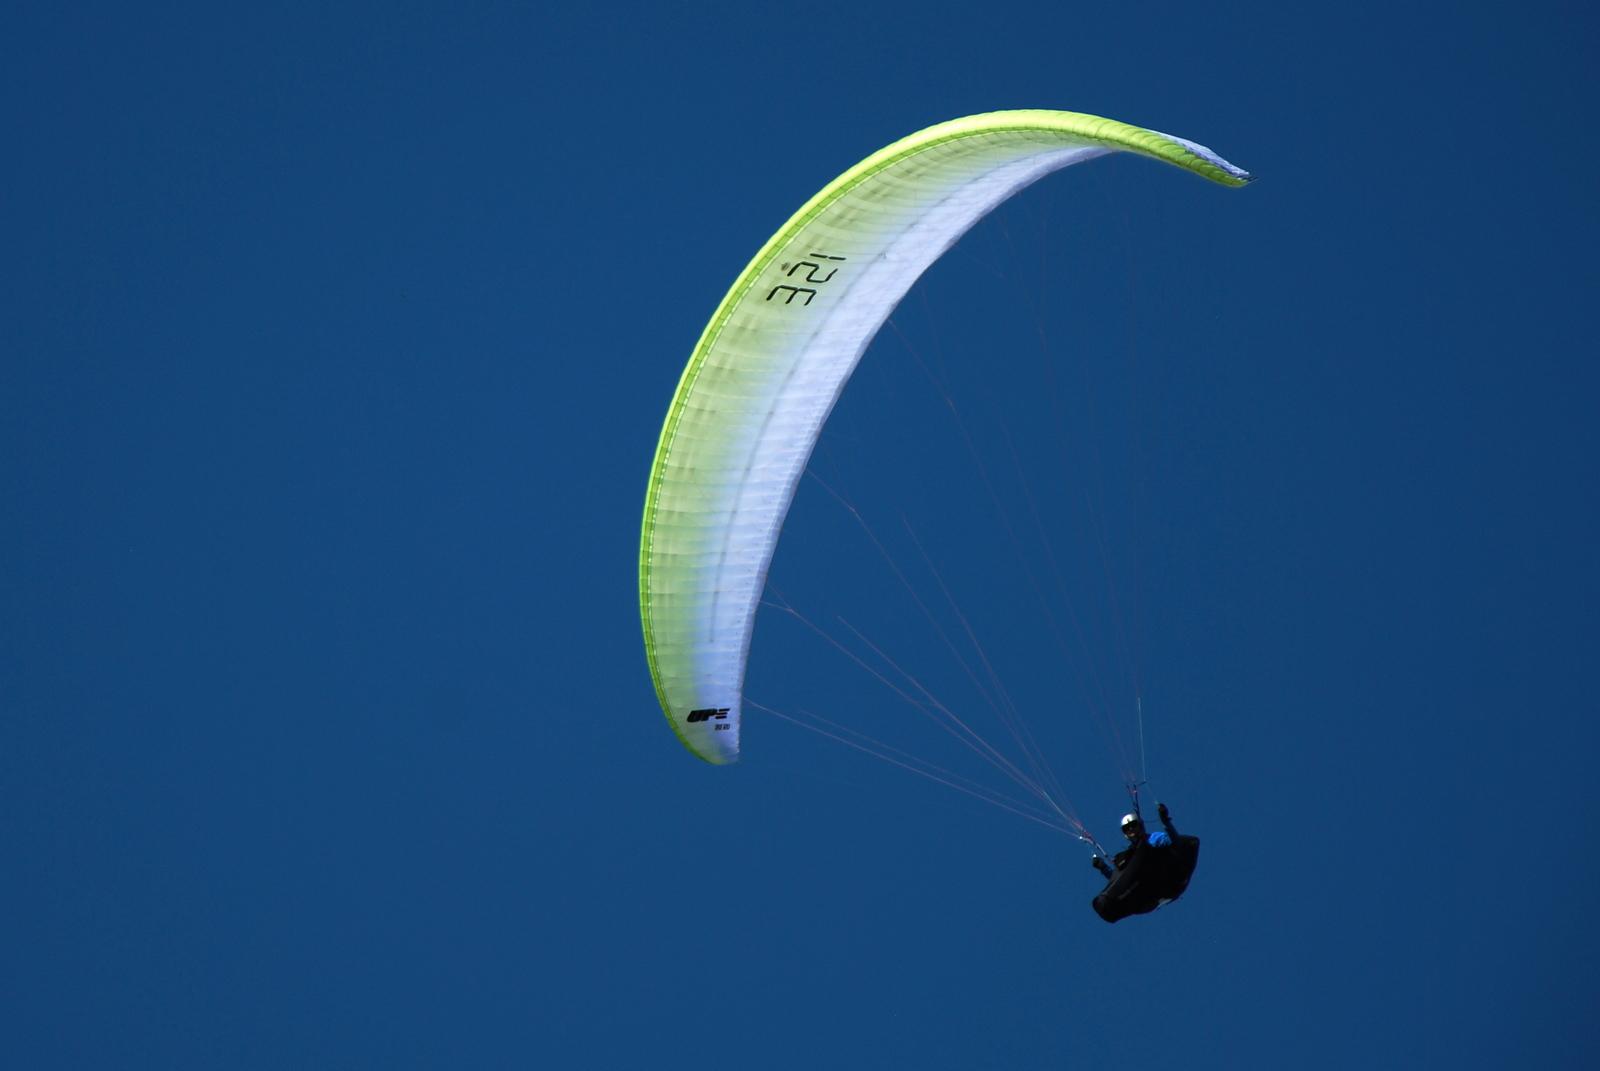 testfly me / UP Meru: at the very top of EN D class